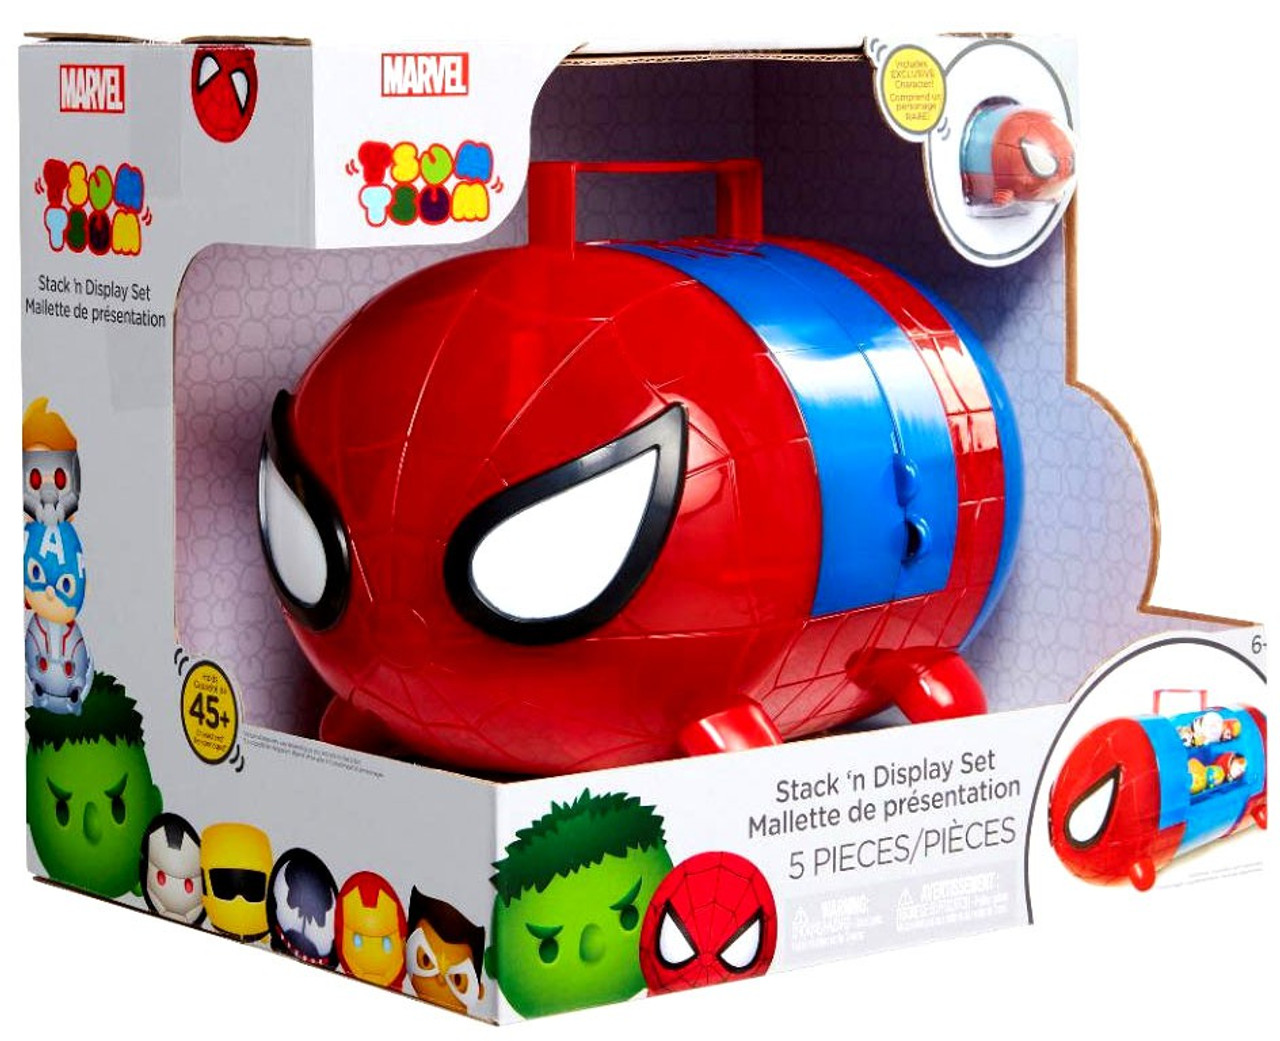 Iron Man Marvel Nose Chara Tsum Tsum Vinyl Mini-Figure